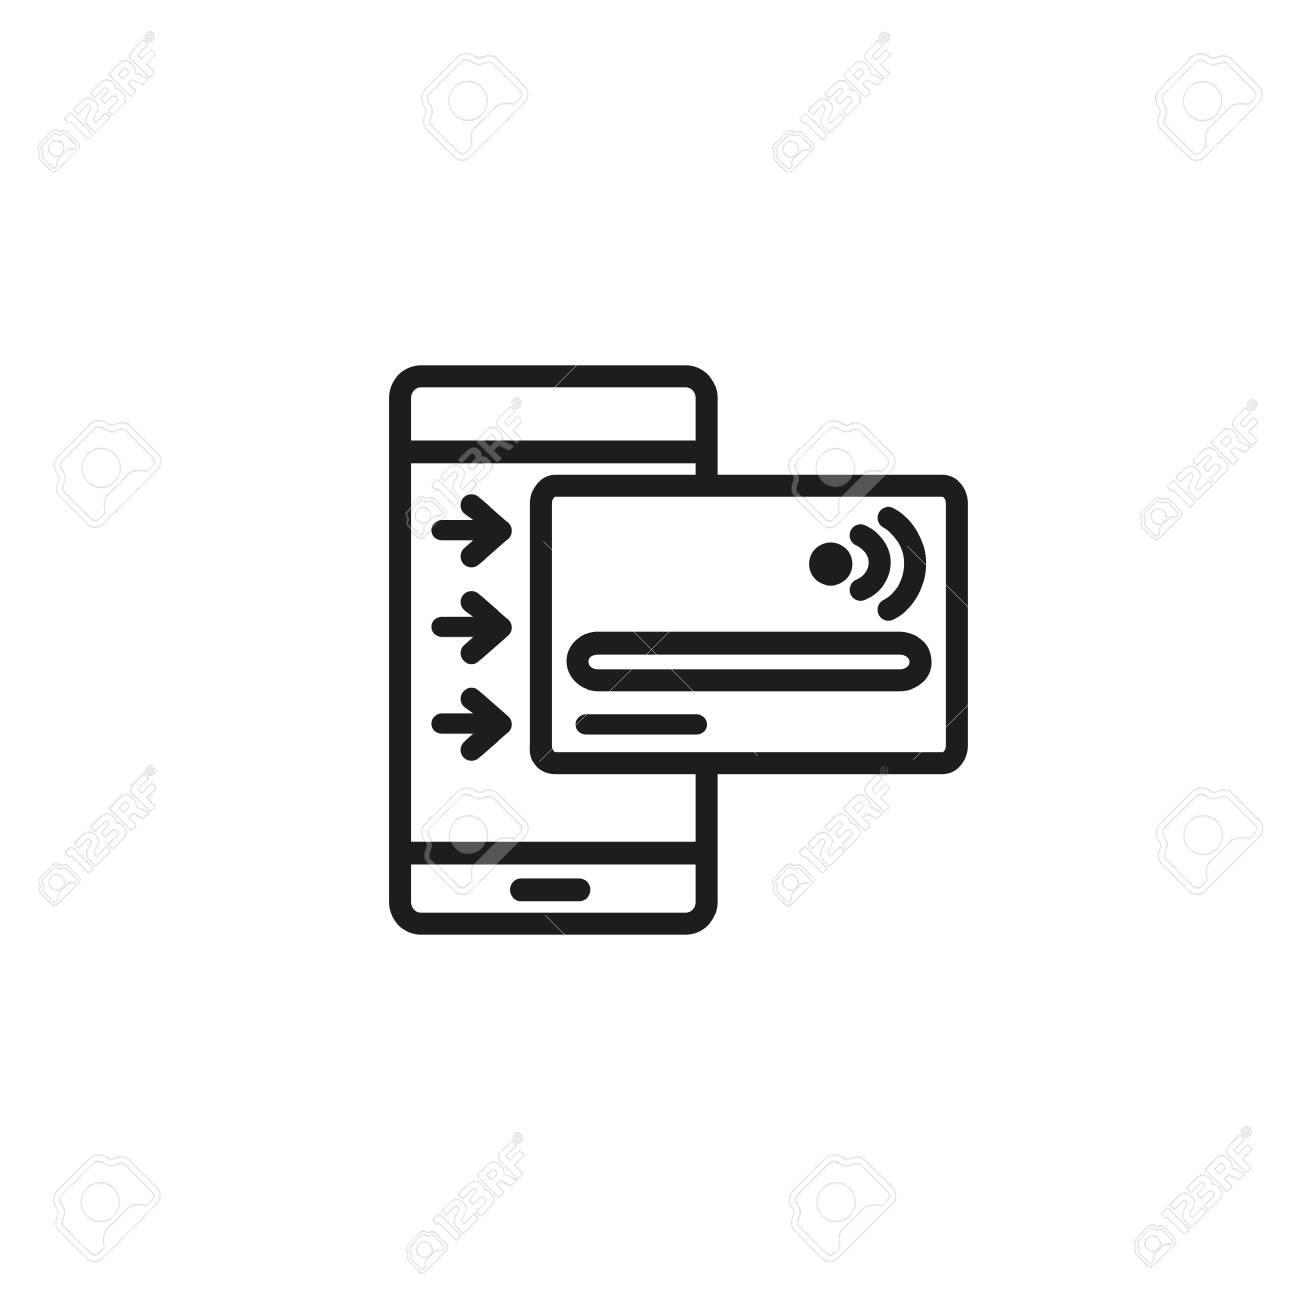 Online Credit Line Icon. Entering Data, Credit Card, Internet